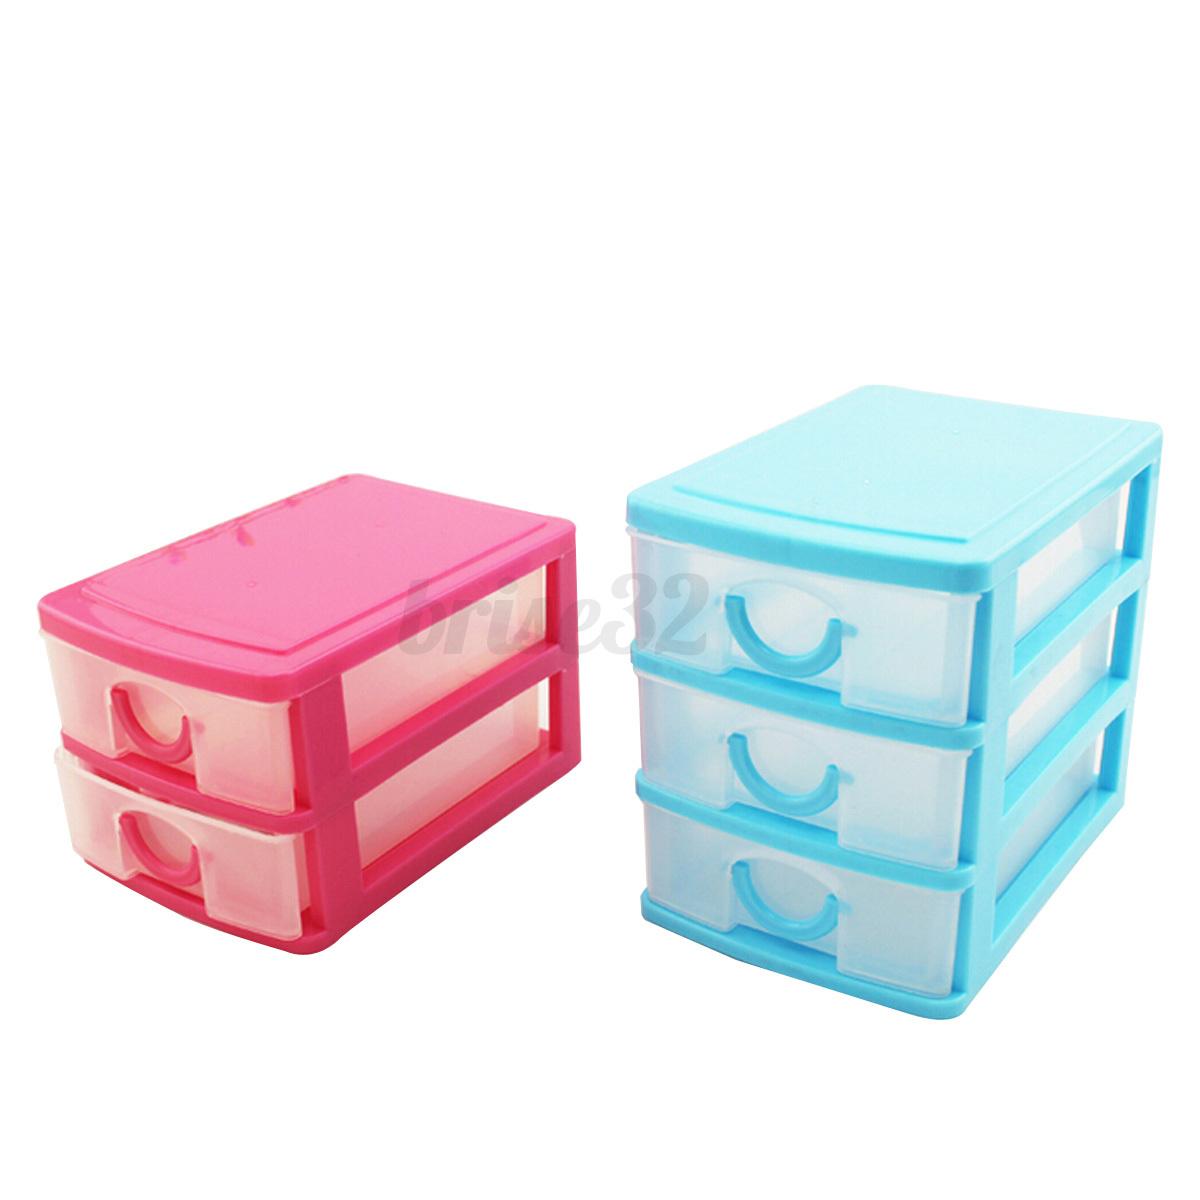 desktop storage box 2 or 3 drawers jewelry organizer holder cabinets case bins ebay. Black Bedroom Furniture Sets. Home Design Ideas